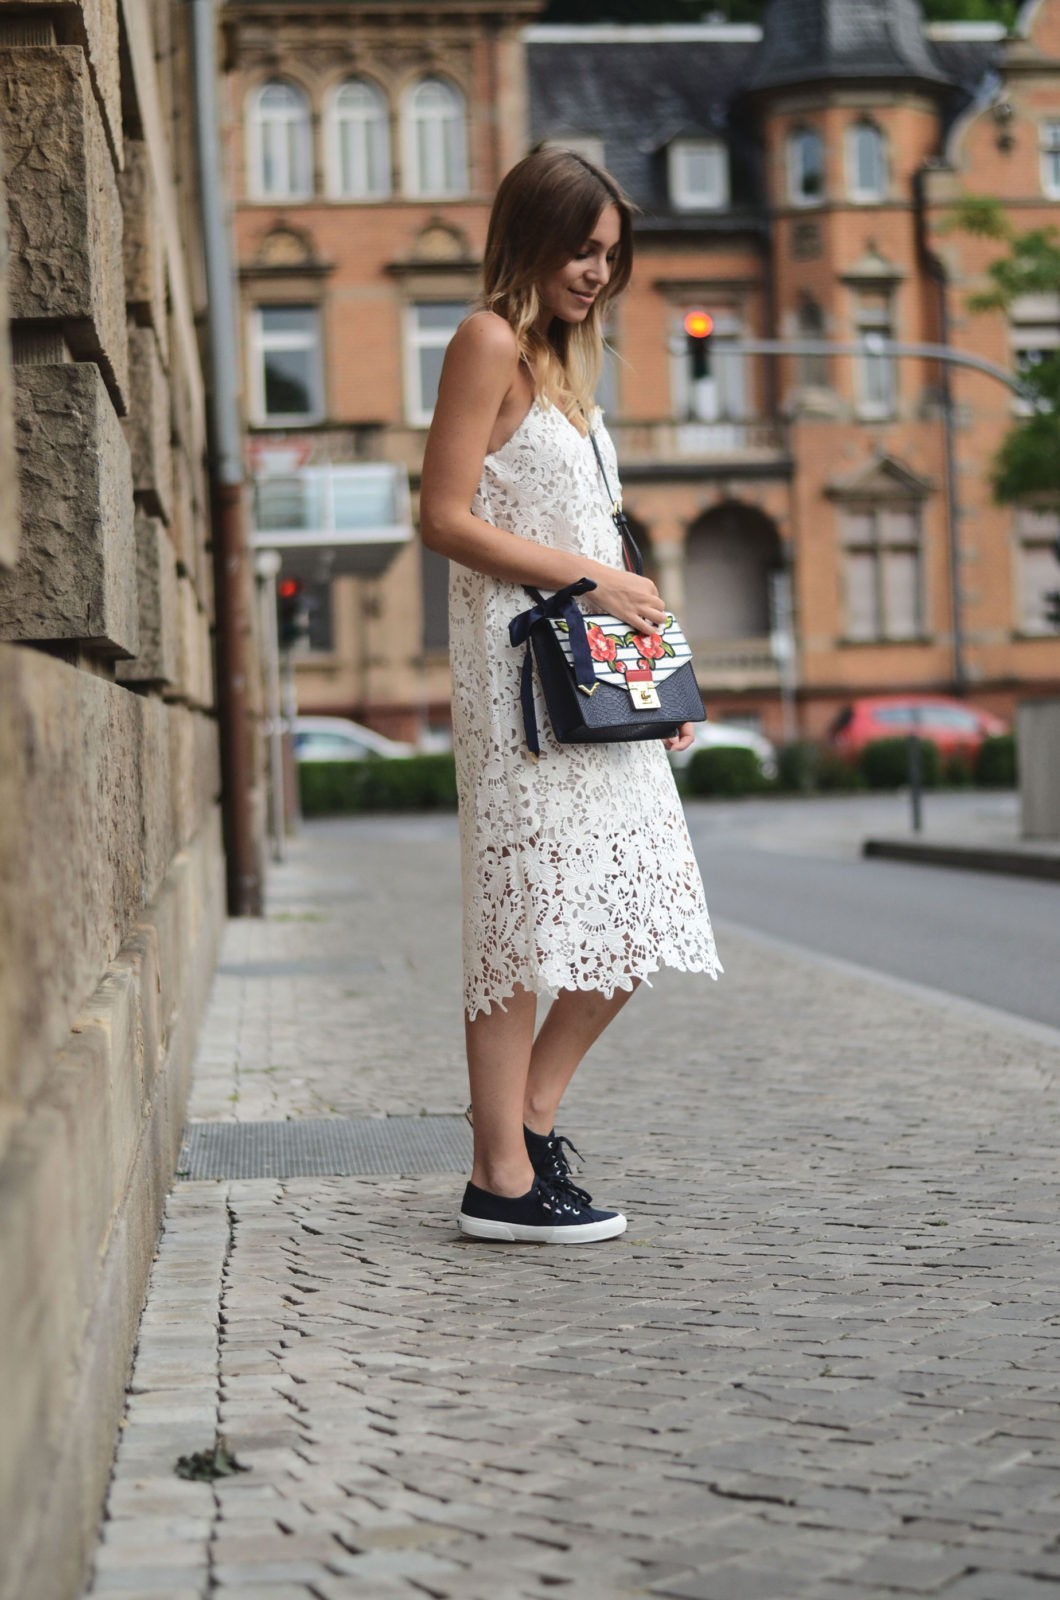 Sariety-modeblog-heidelberg-sarah-czok-fashionblogger-zara-spitzenkleid-superga-aldo-bag-3